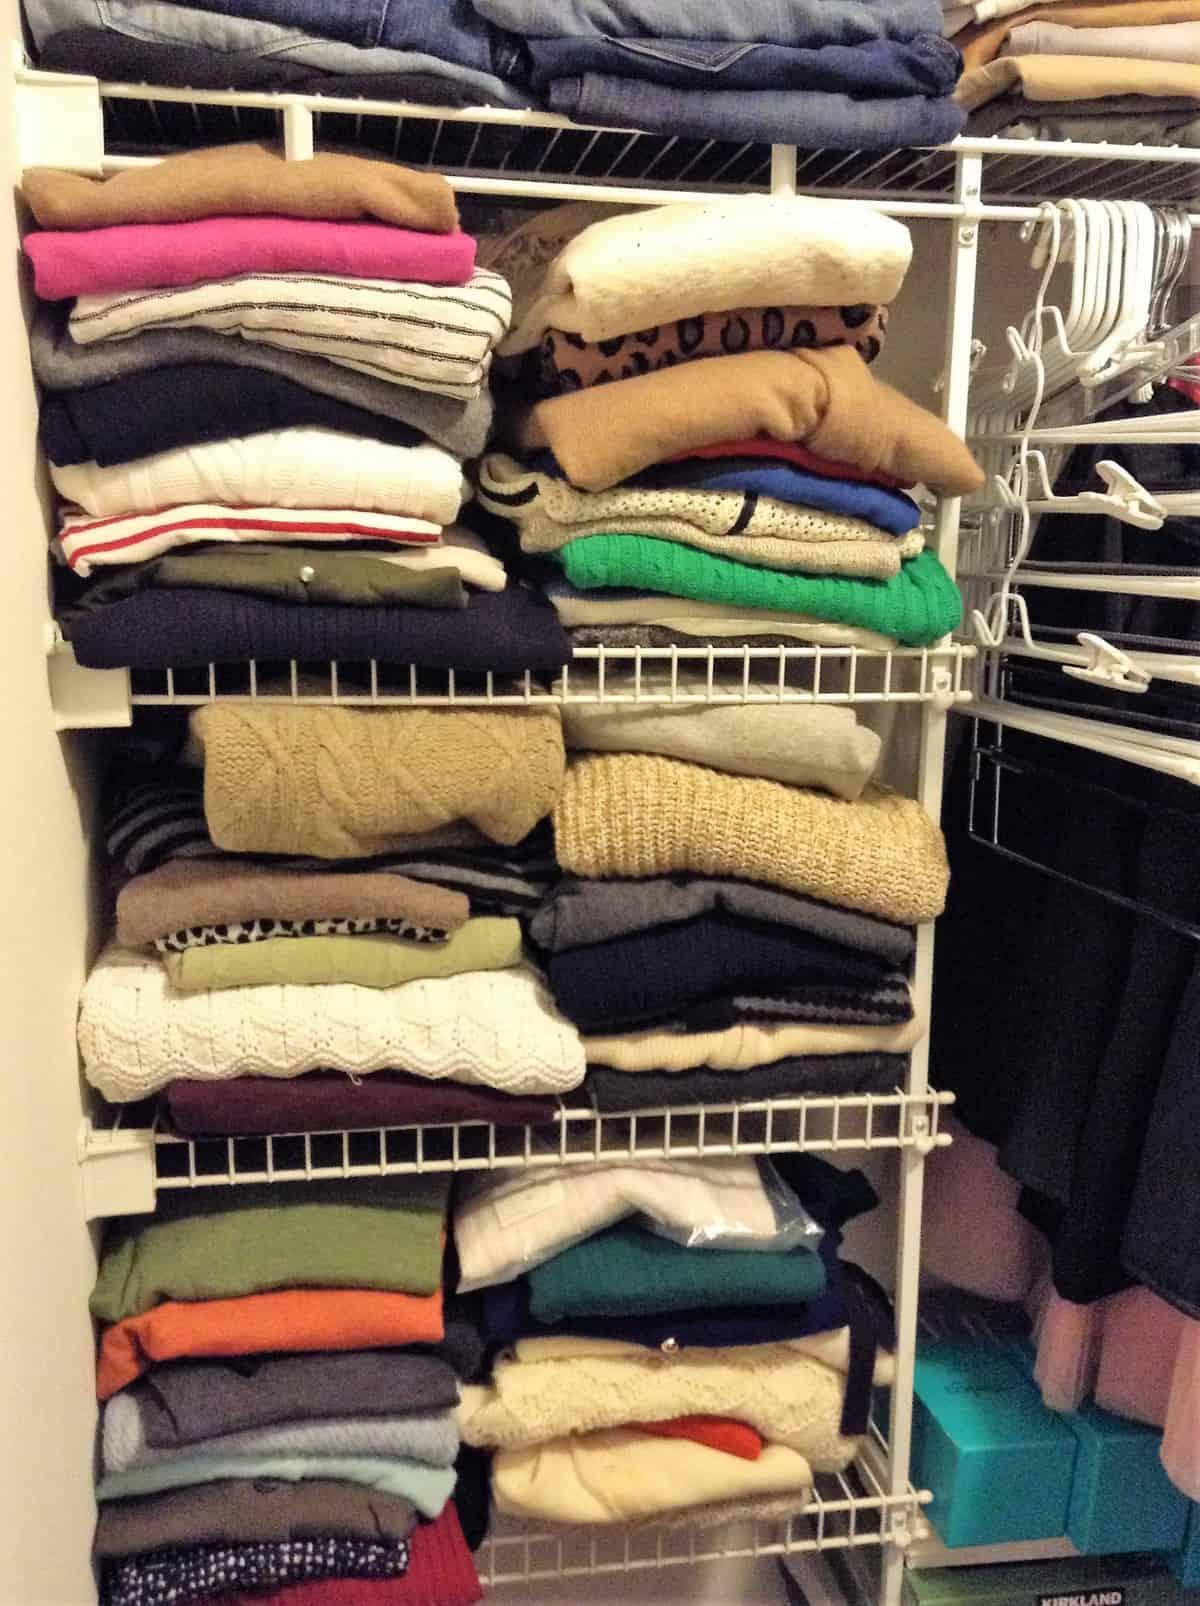 Use Rectangular Utility Tote Bags To Organize Your Closet Make Stacks